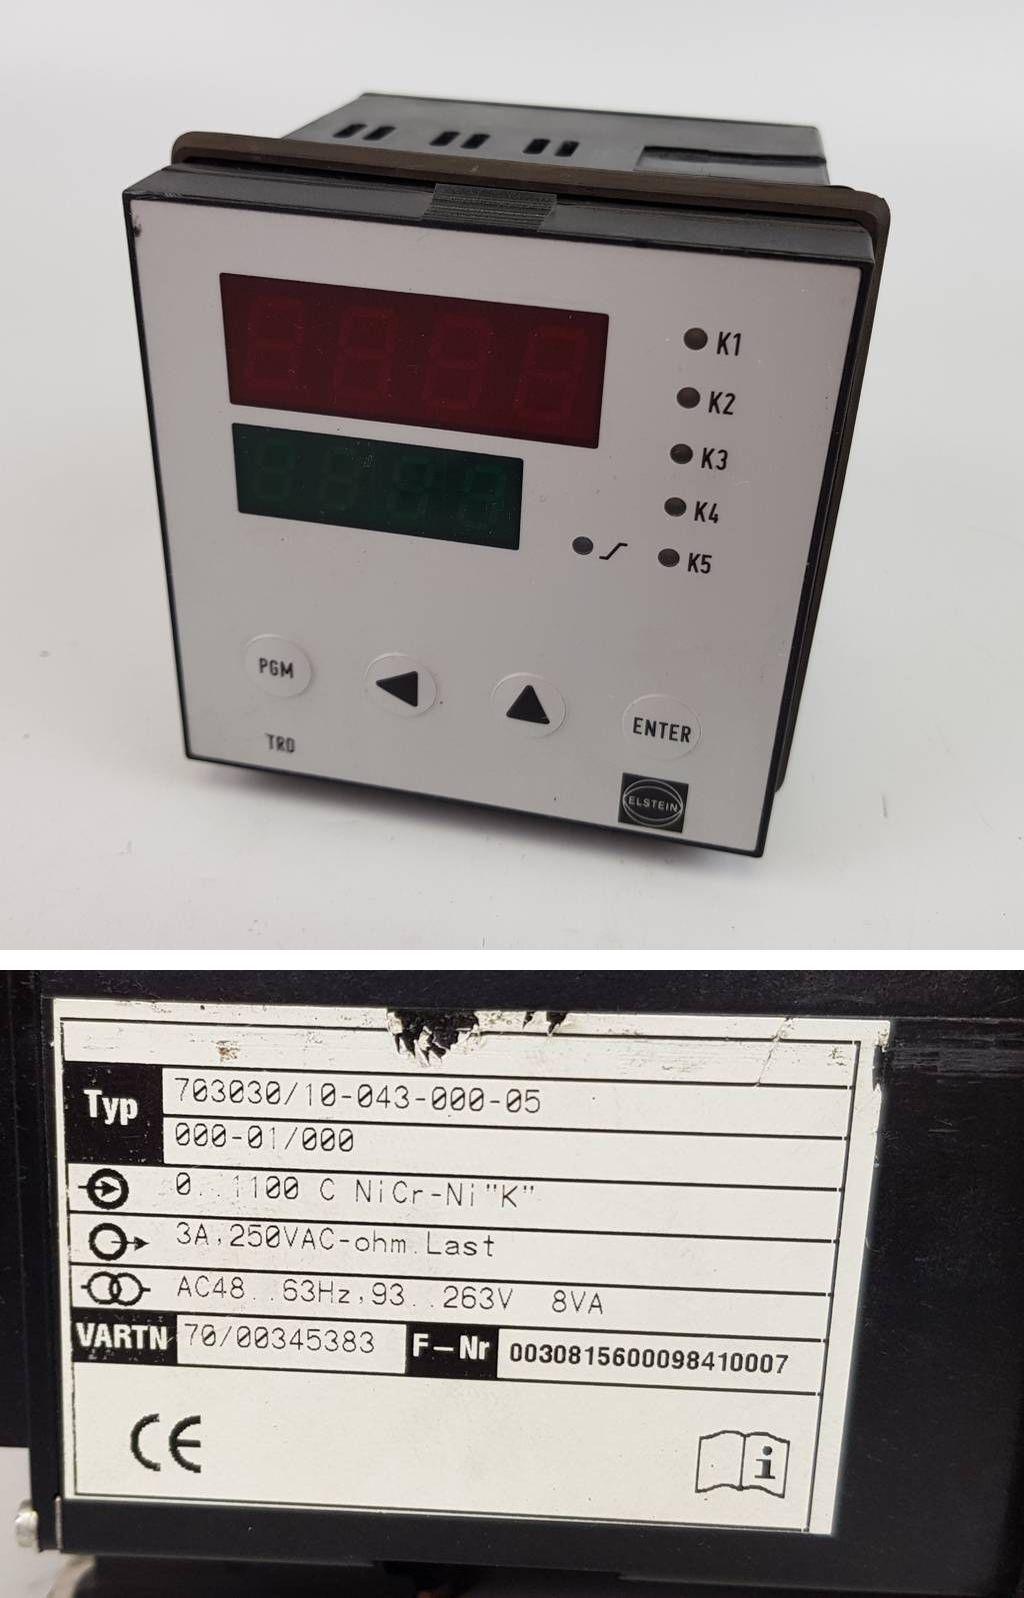 AC 230V guter Zustand TE-1W0 elektronischer Temperaturregler Typ Jumo TE1